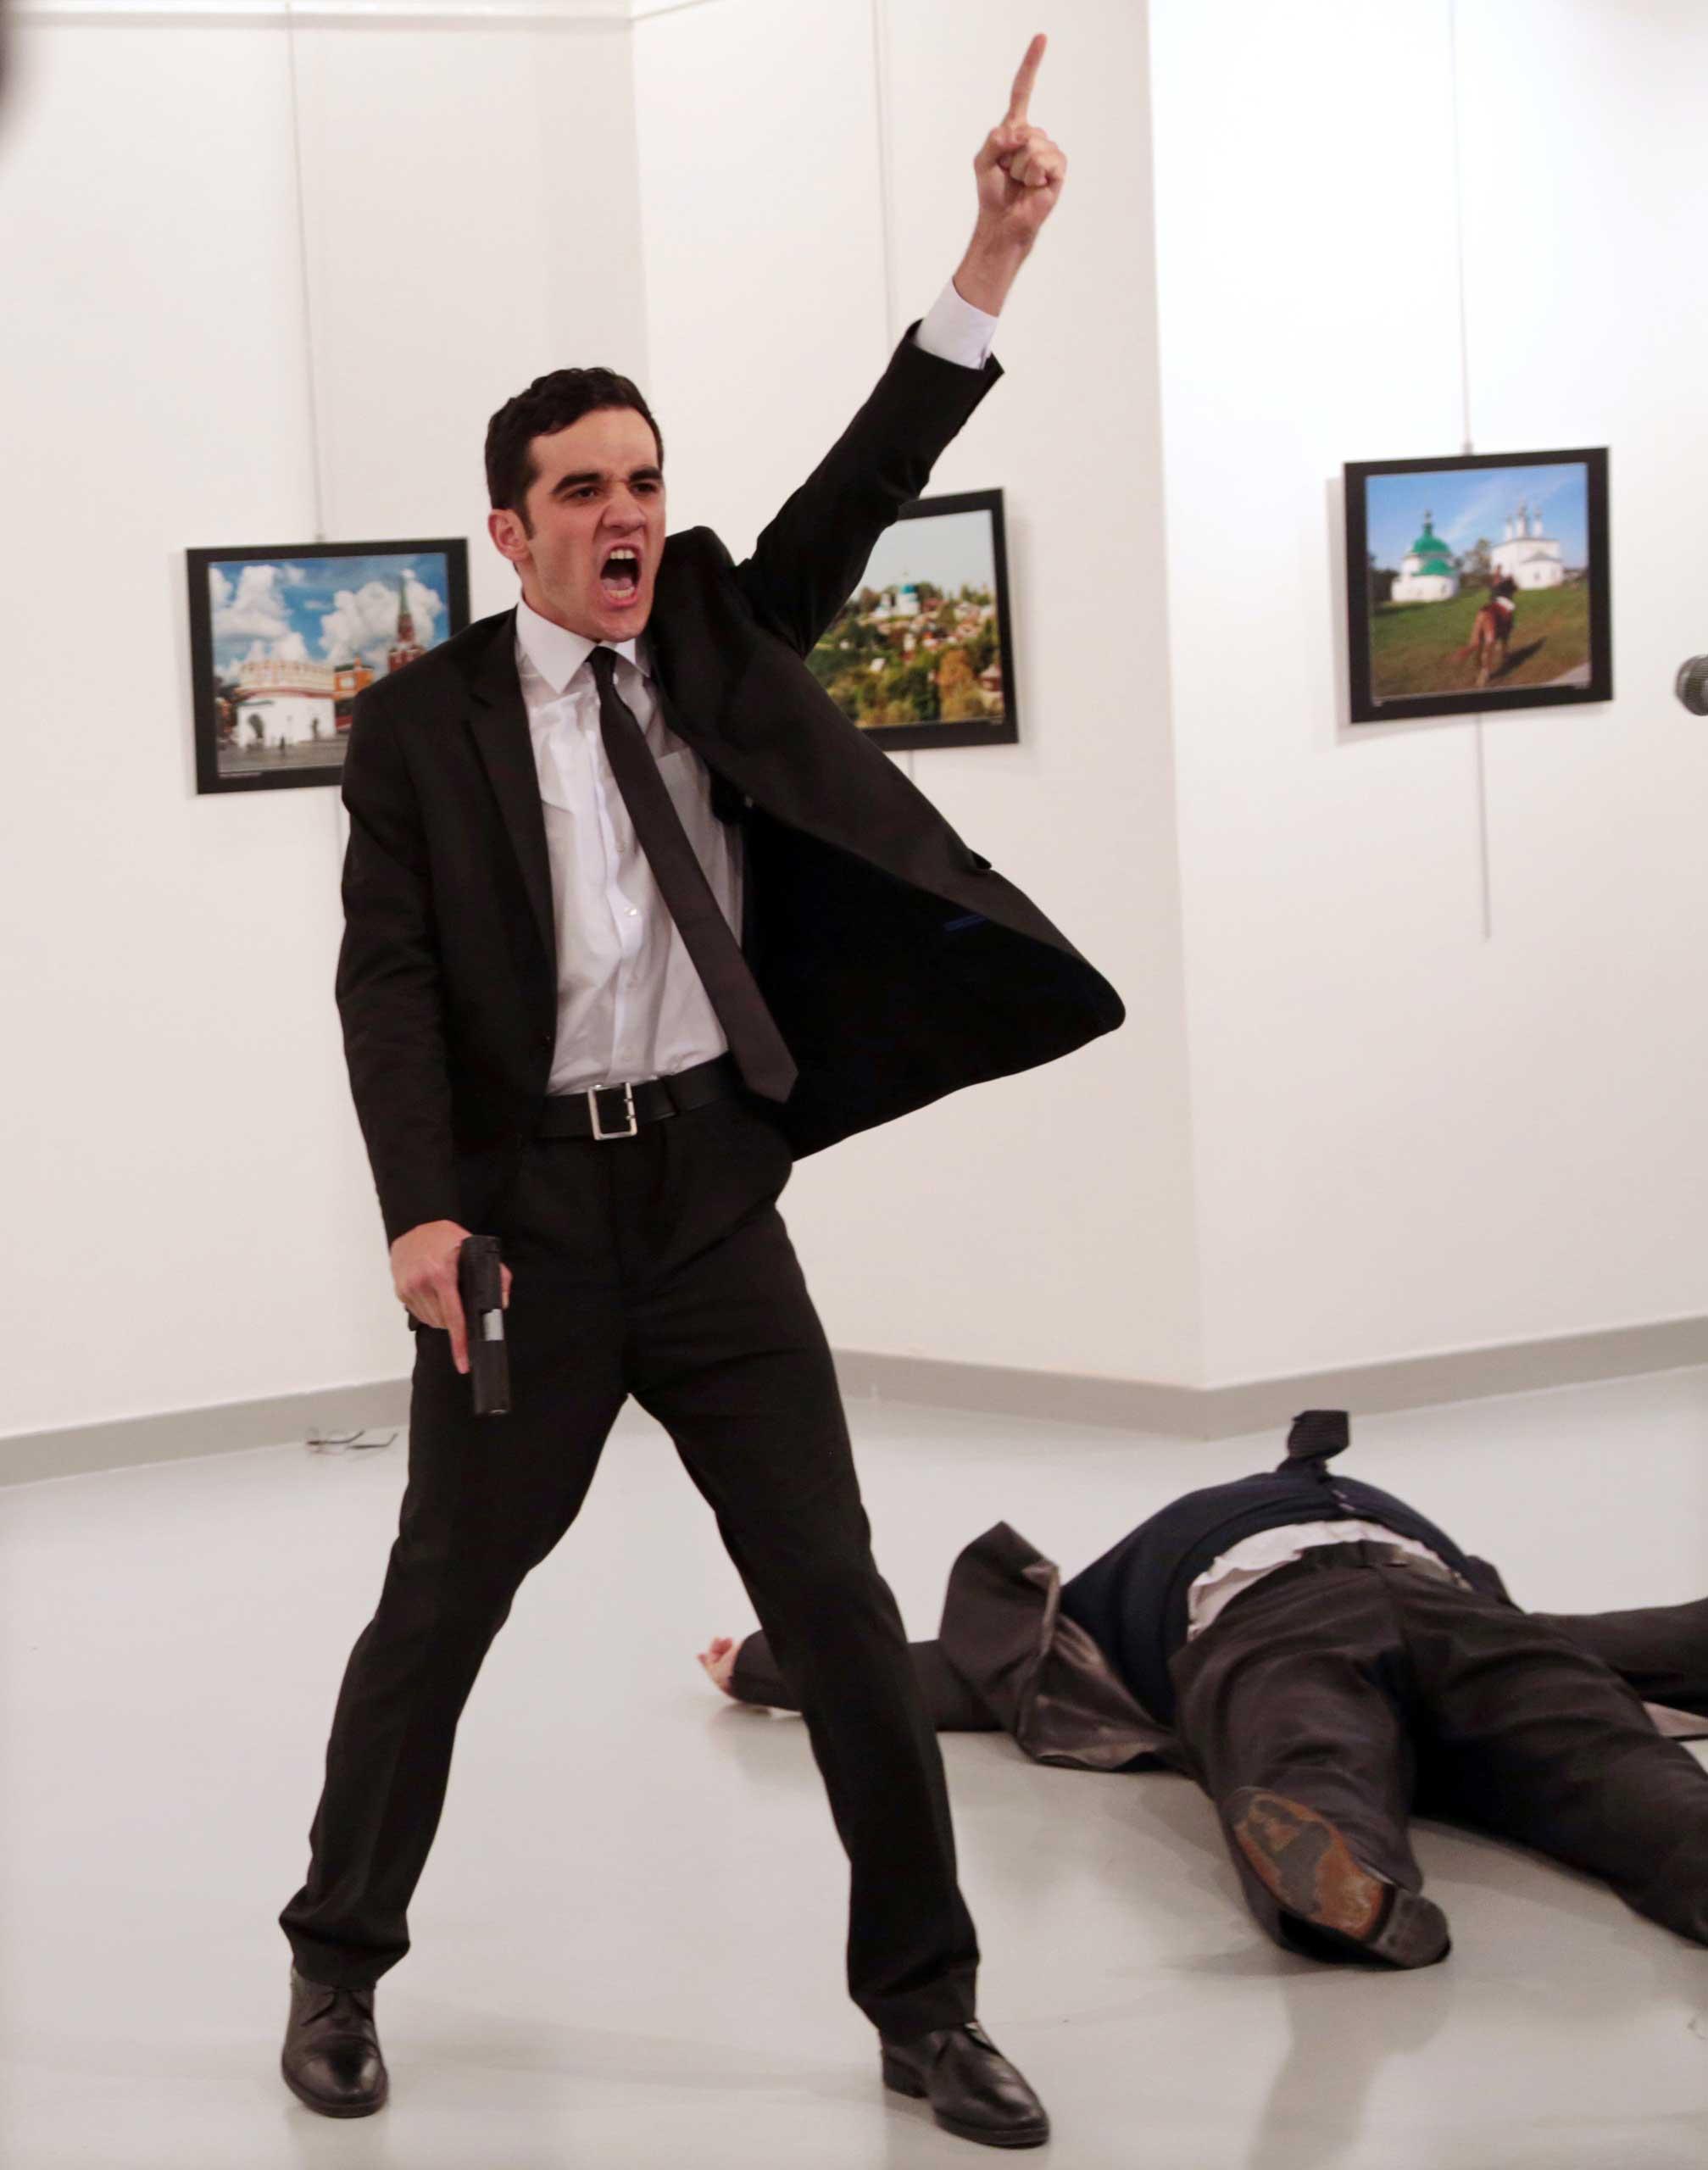 Mevlut Mert Altintas shouts after shooting Andrei Karlov, right, the Russian ambassador to Turkey, at an art gallery in Ankara, Turkey, Dec. 19, 2016.